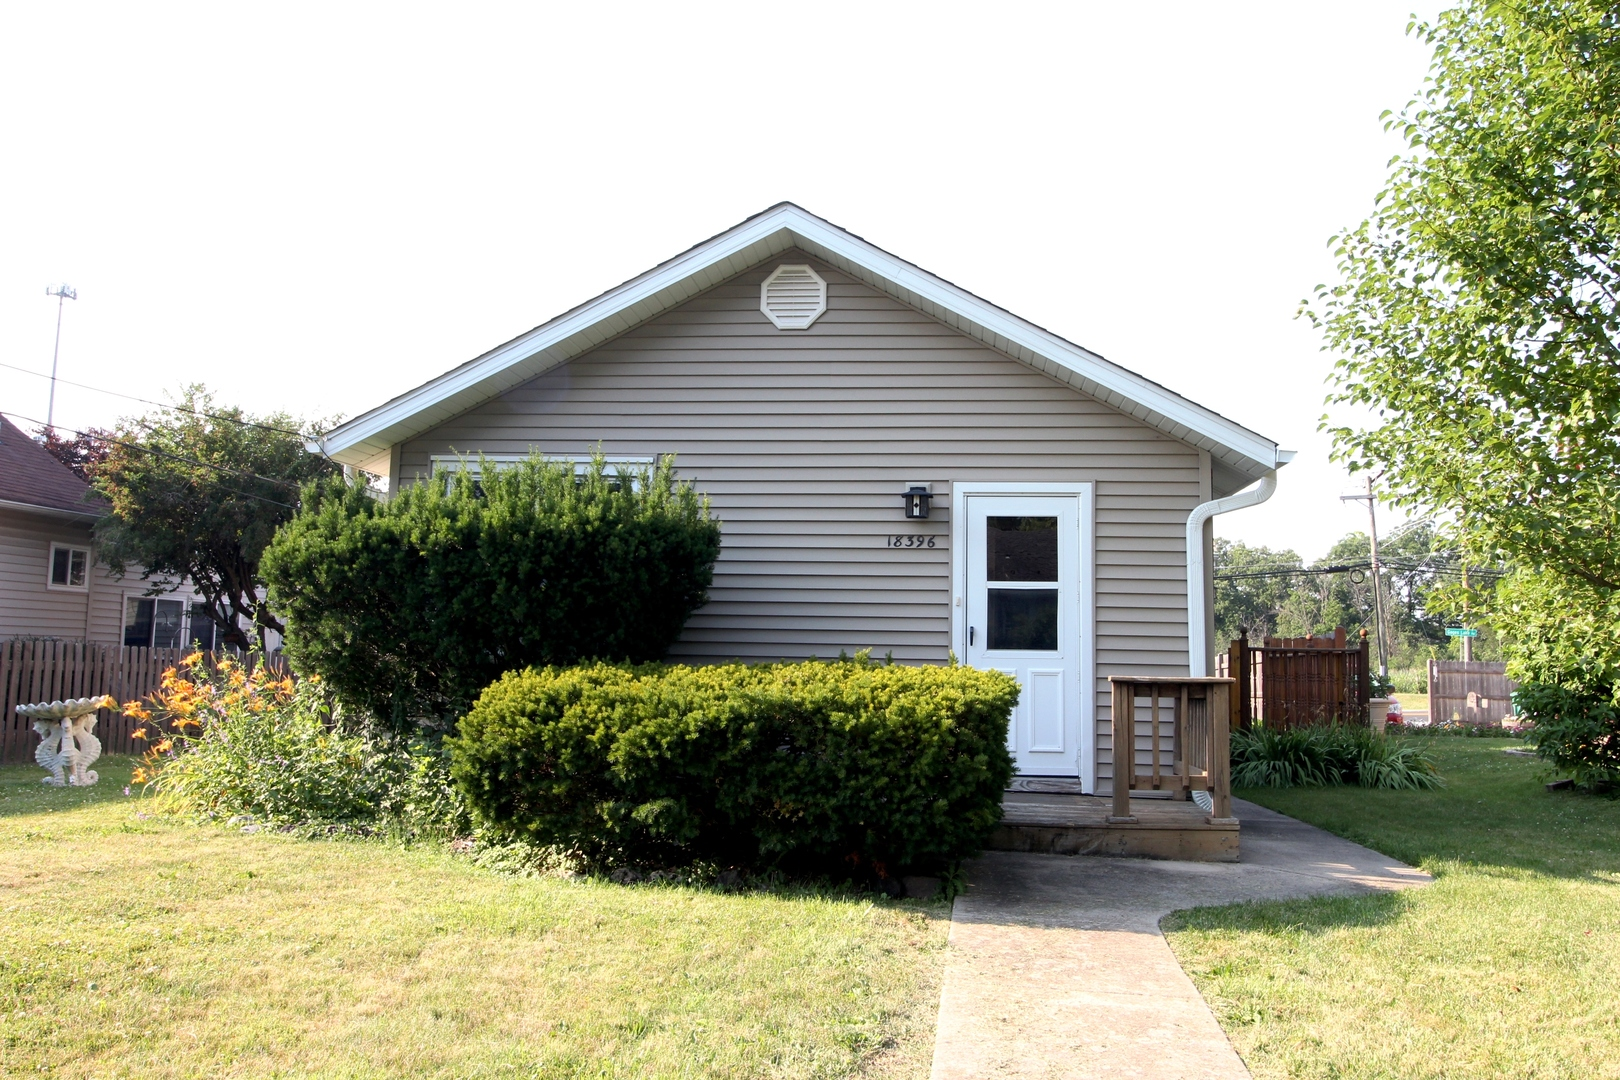 18396 W Grand Drive, Grayslake IL 60030